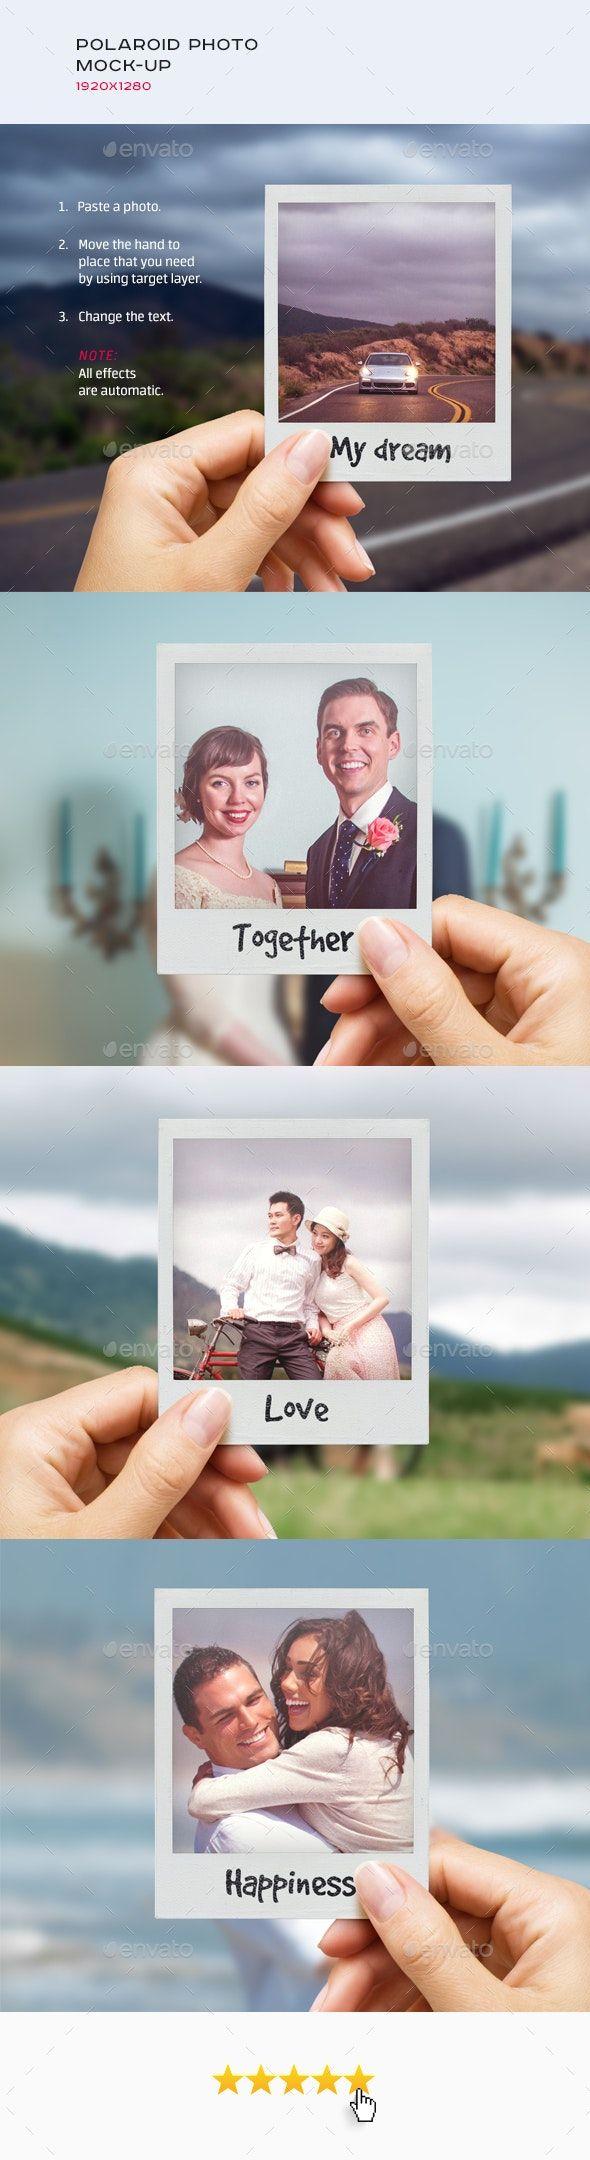 Polaroid Photo Mock Up Fotografi